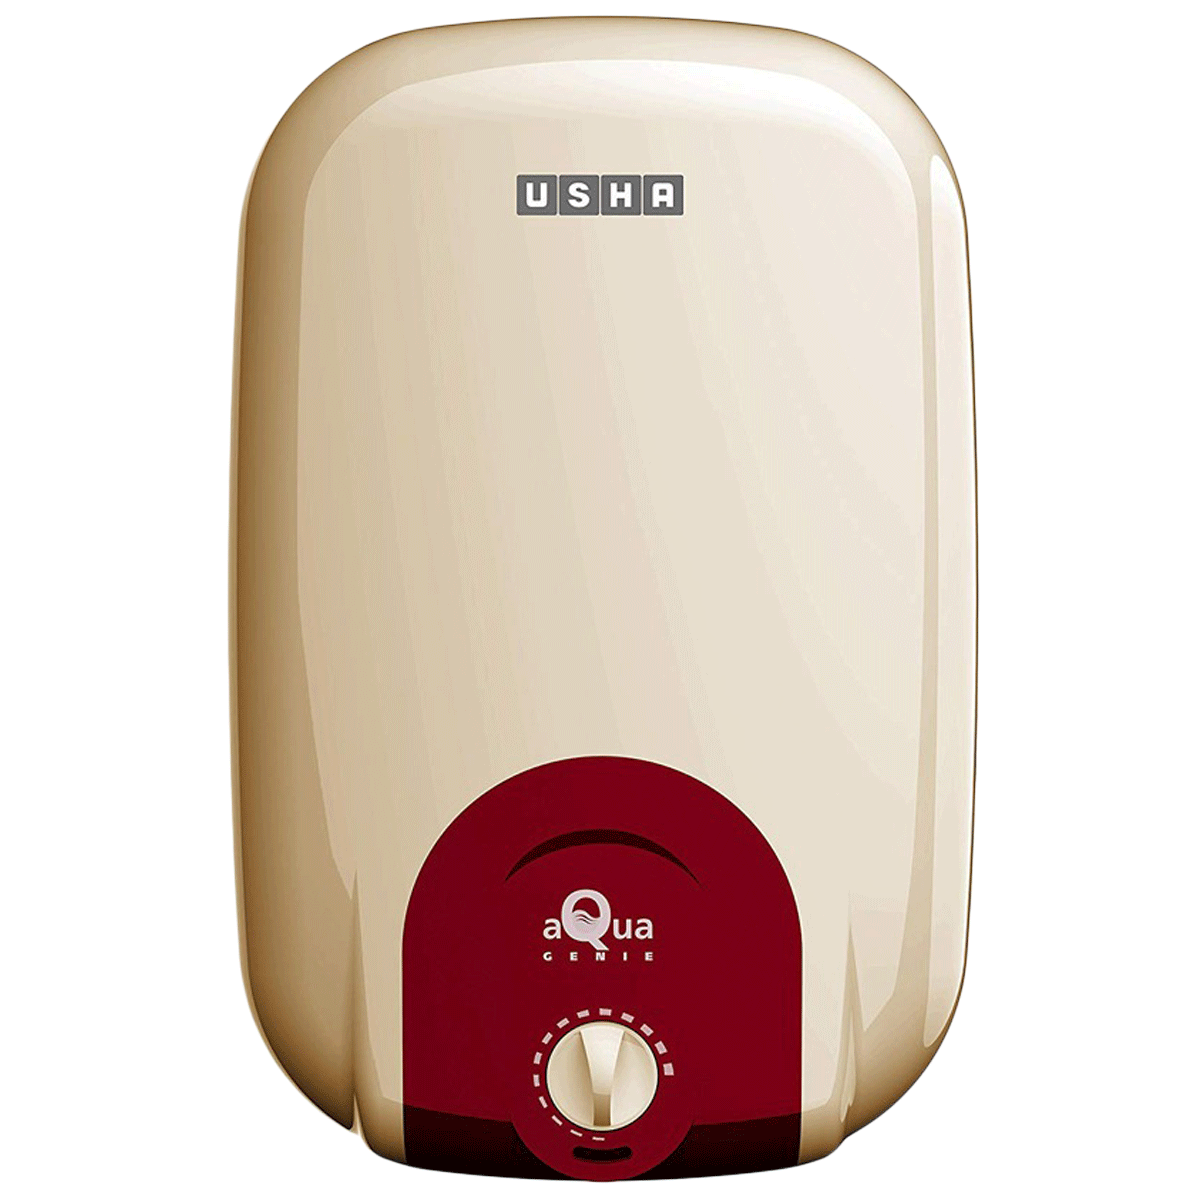 Usha 25 Litres 5 Star Storage Water Geyser (2000 Watts, Aqua Genie, Ivory Red)_1